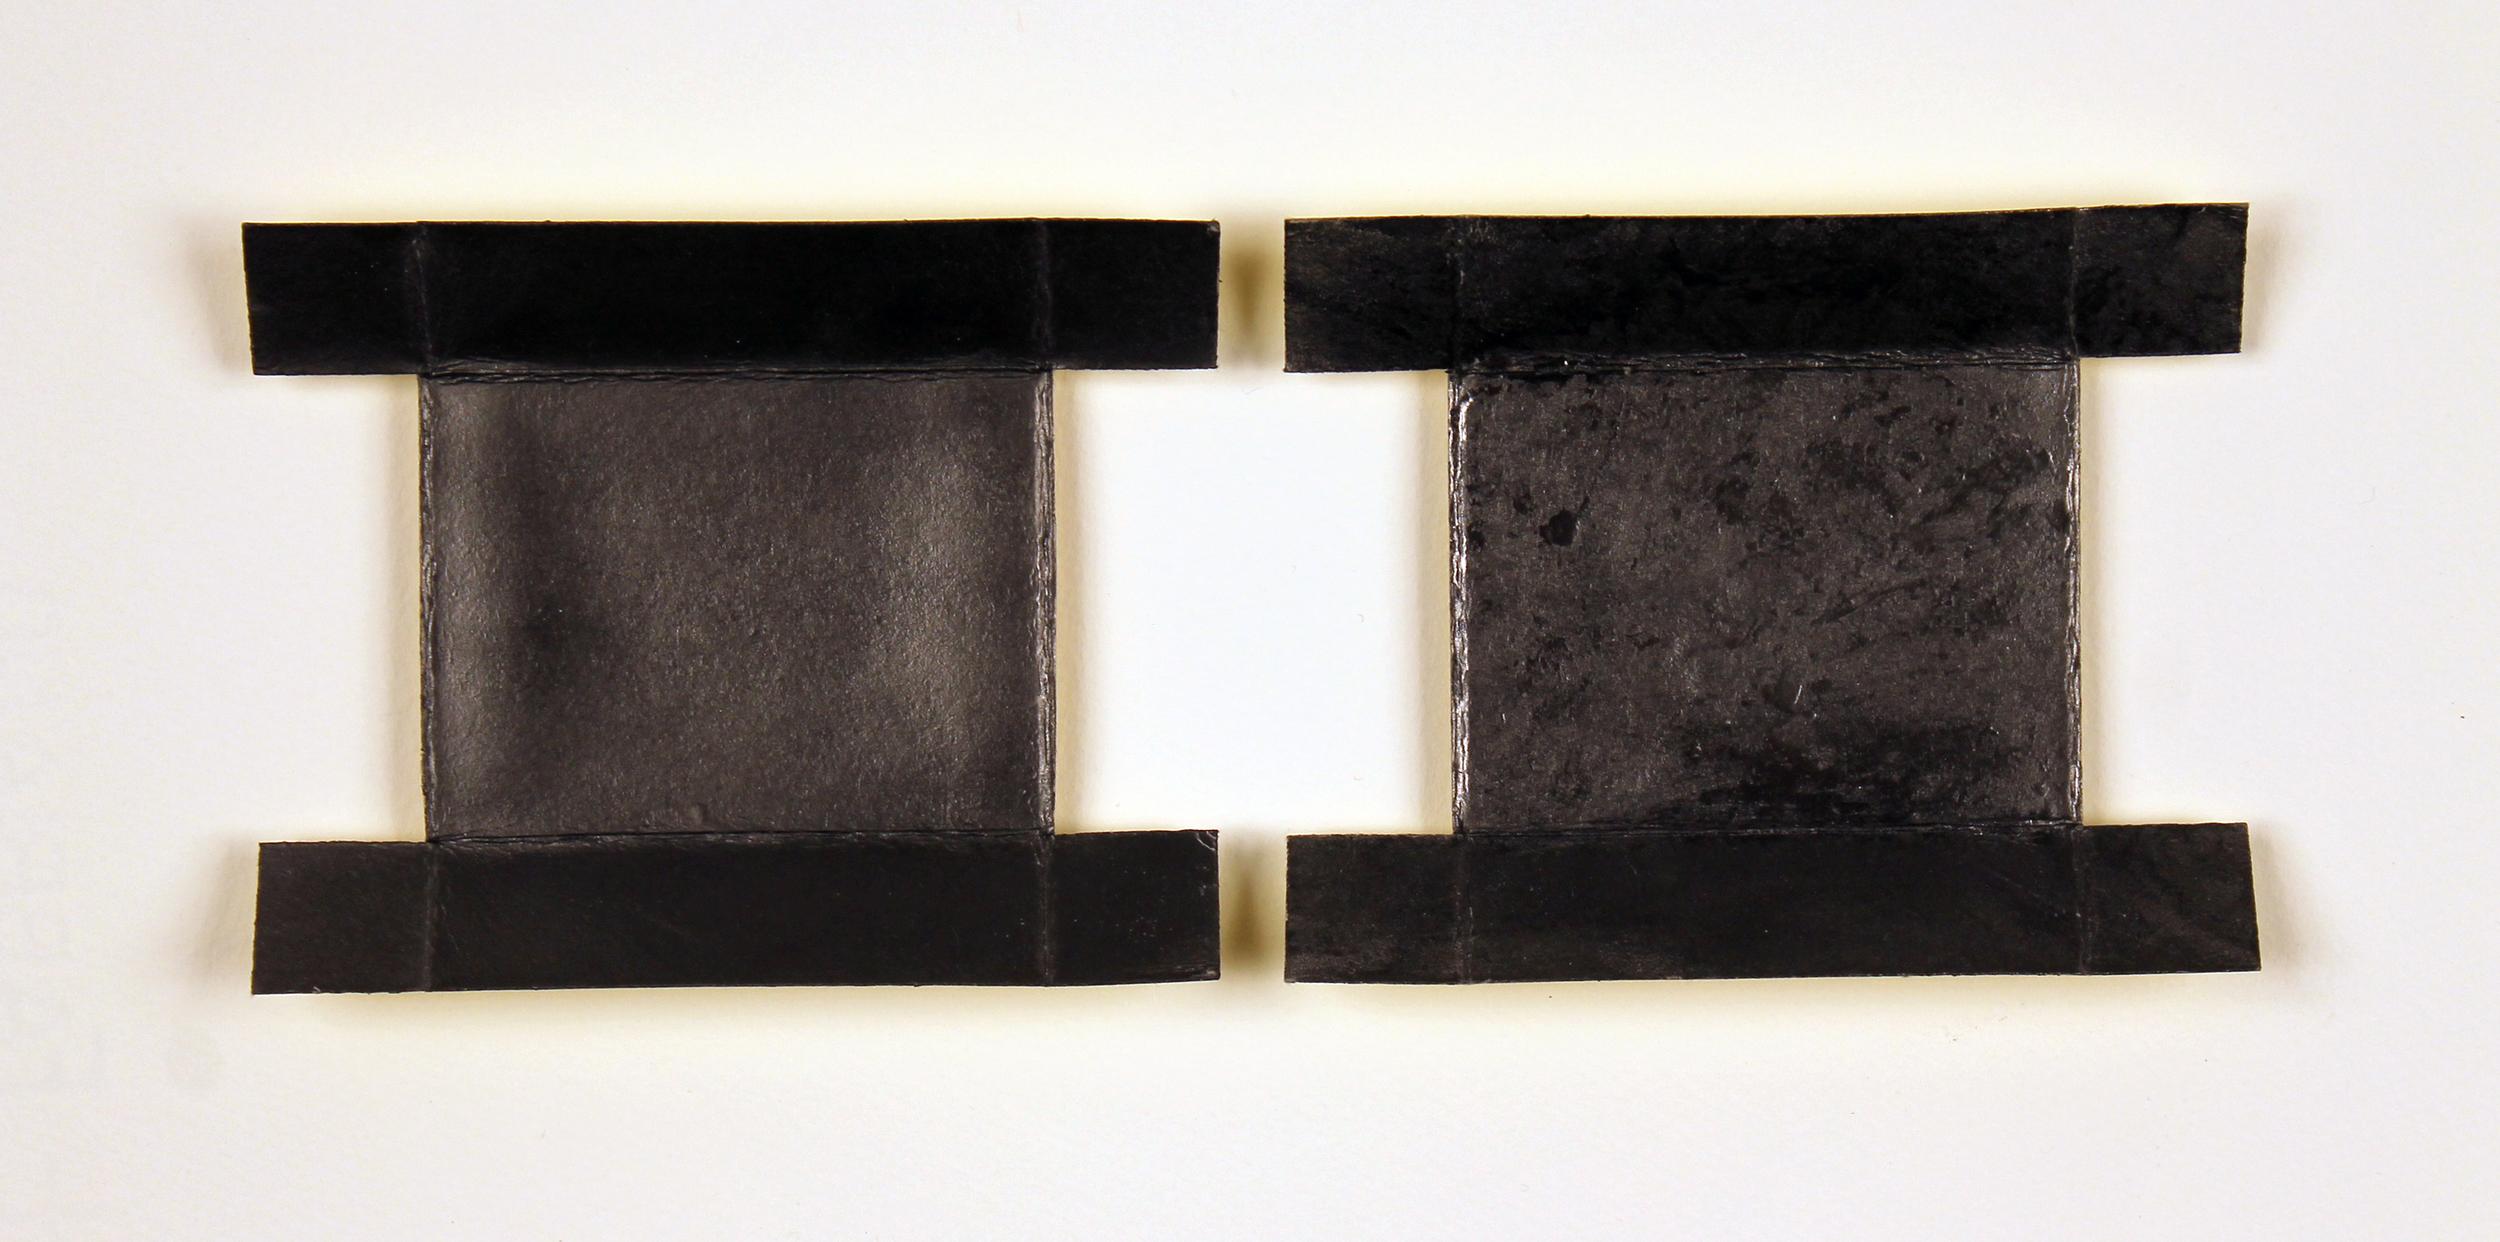 "Chroma (Yellow for Derek Jarman)  Graphite powder, silkscreened pigment, archival wax on cardboard, 12.25"" x 15.25"" (framed), 2013"